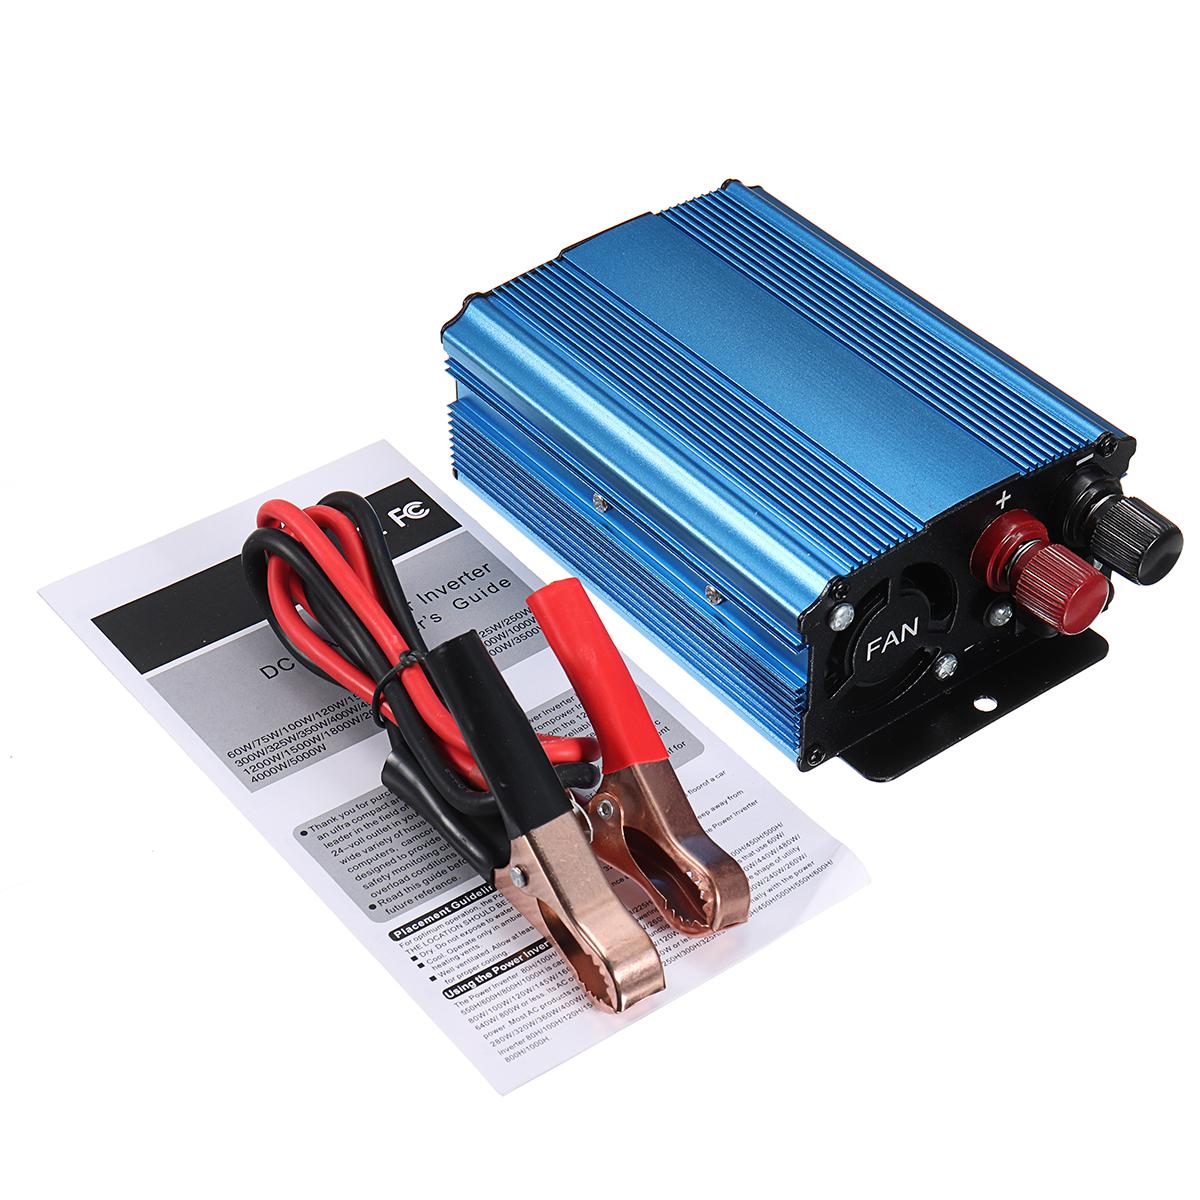 DC 12V To AC 220V Solar Power Inverter 500W Peak Modified Sine Wave  Converter